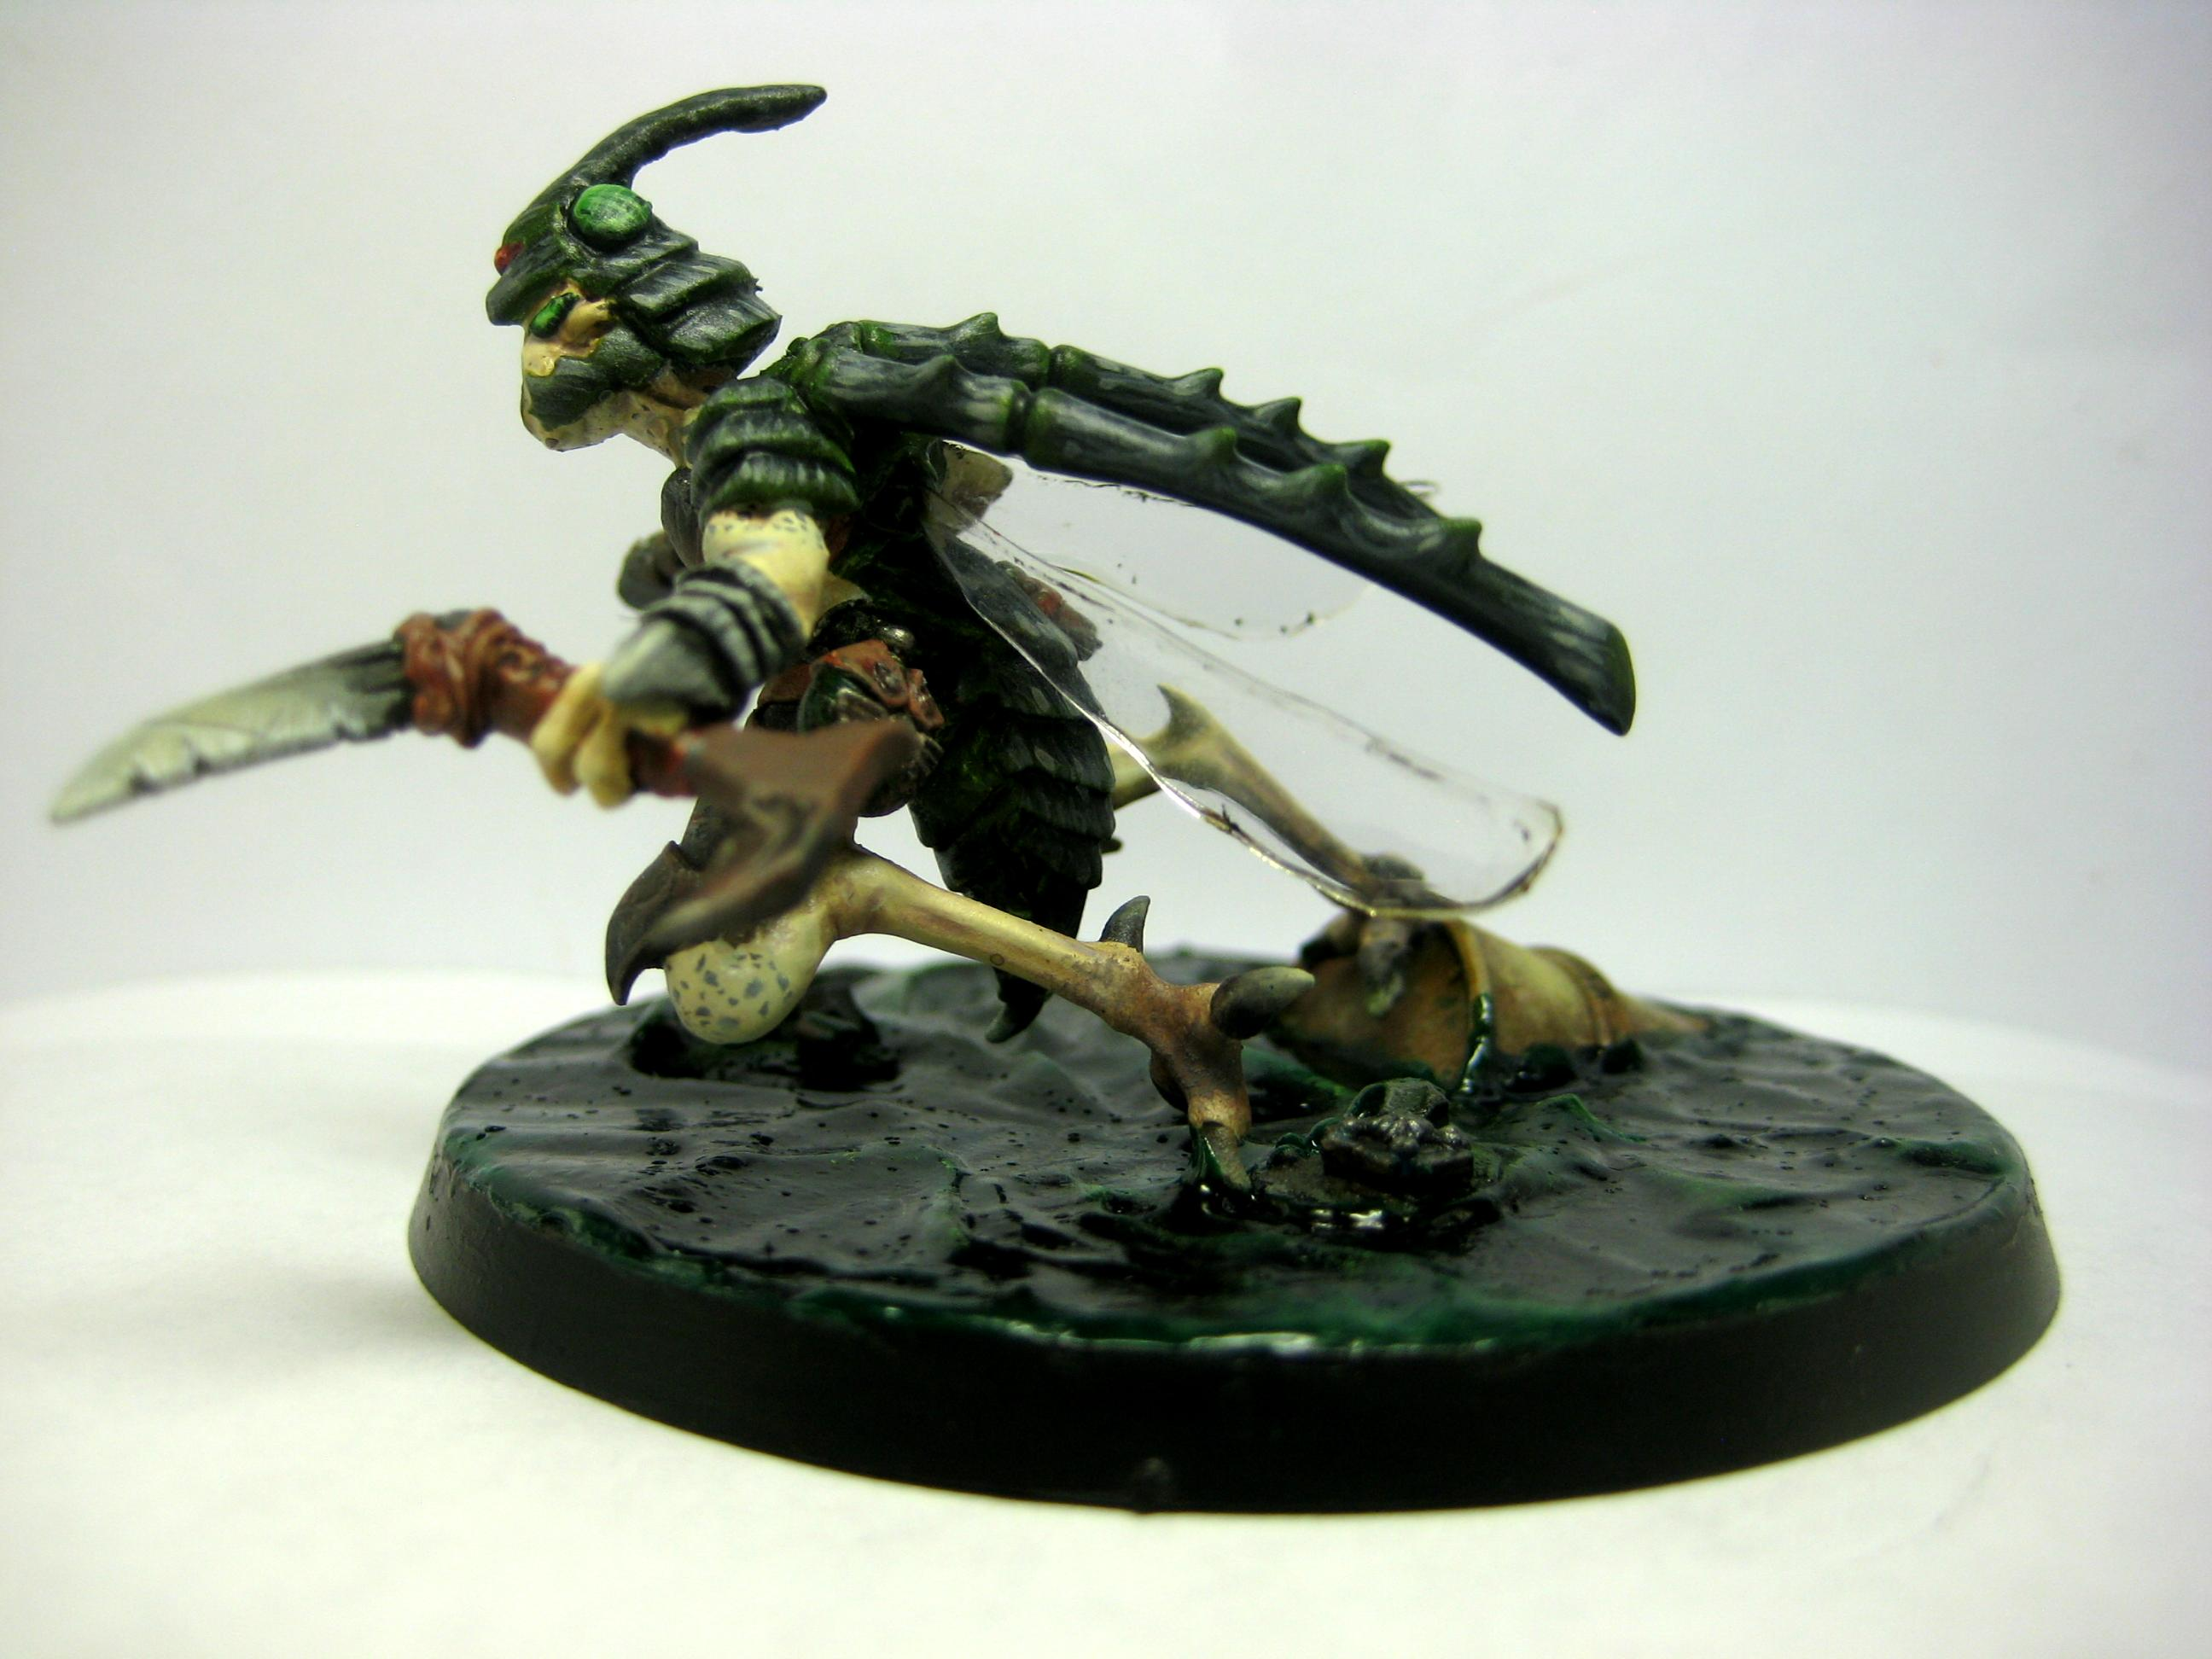 Assassin, Conversion, Greenstuff, Samurai, Sorcerer, Stingwing, Tau, Tzeentch, Warhammer 40,000, Warhammer Fantasy